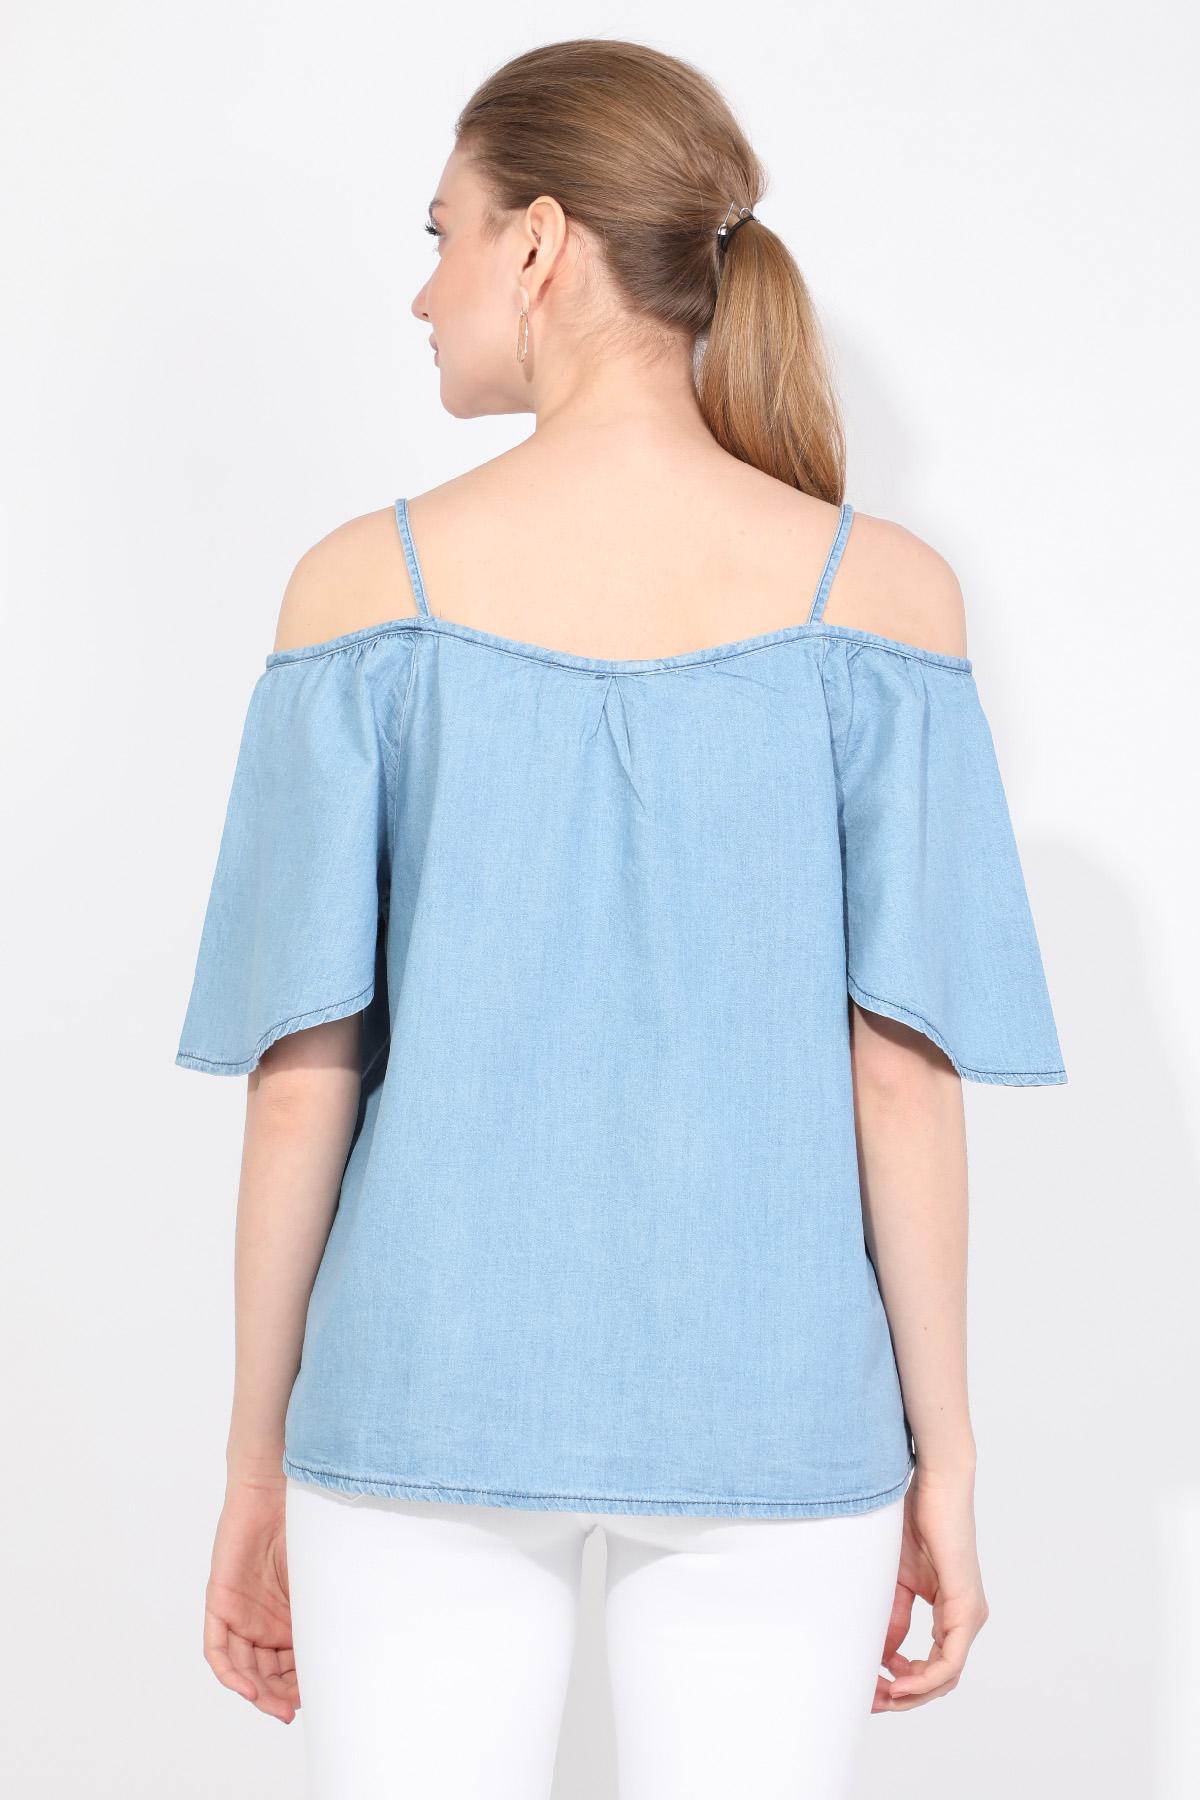 Blue White Kadın Jean Bluz